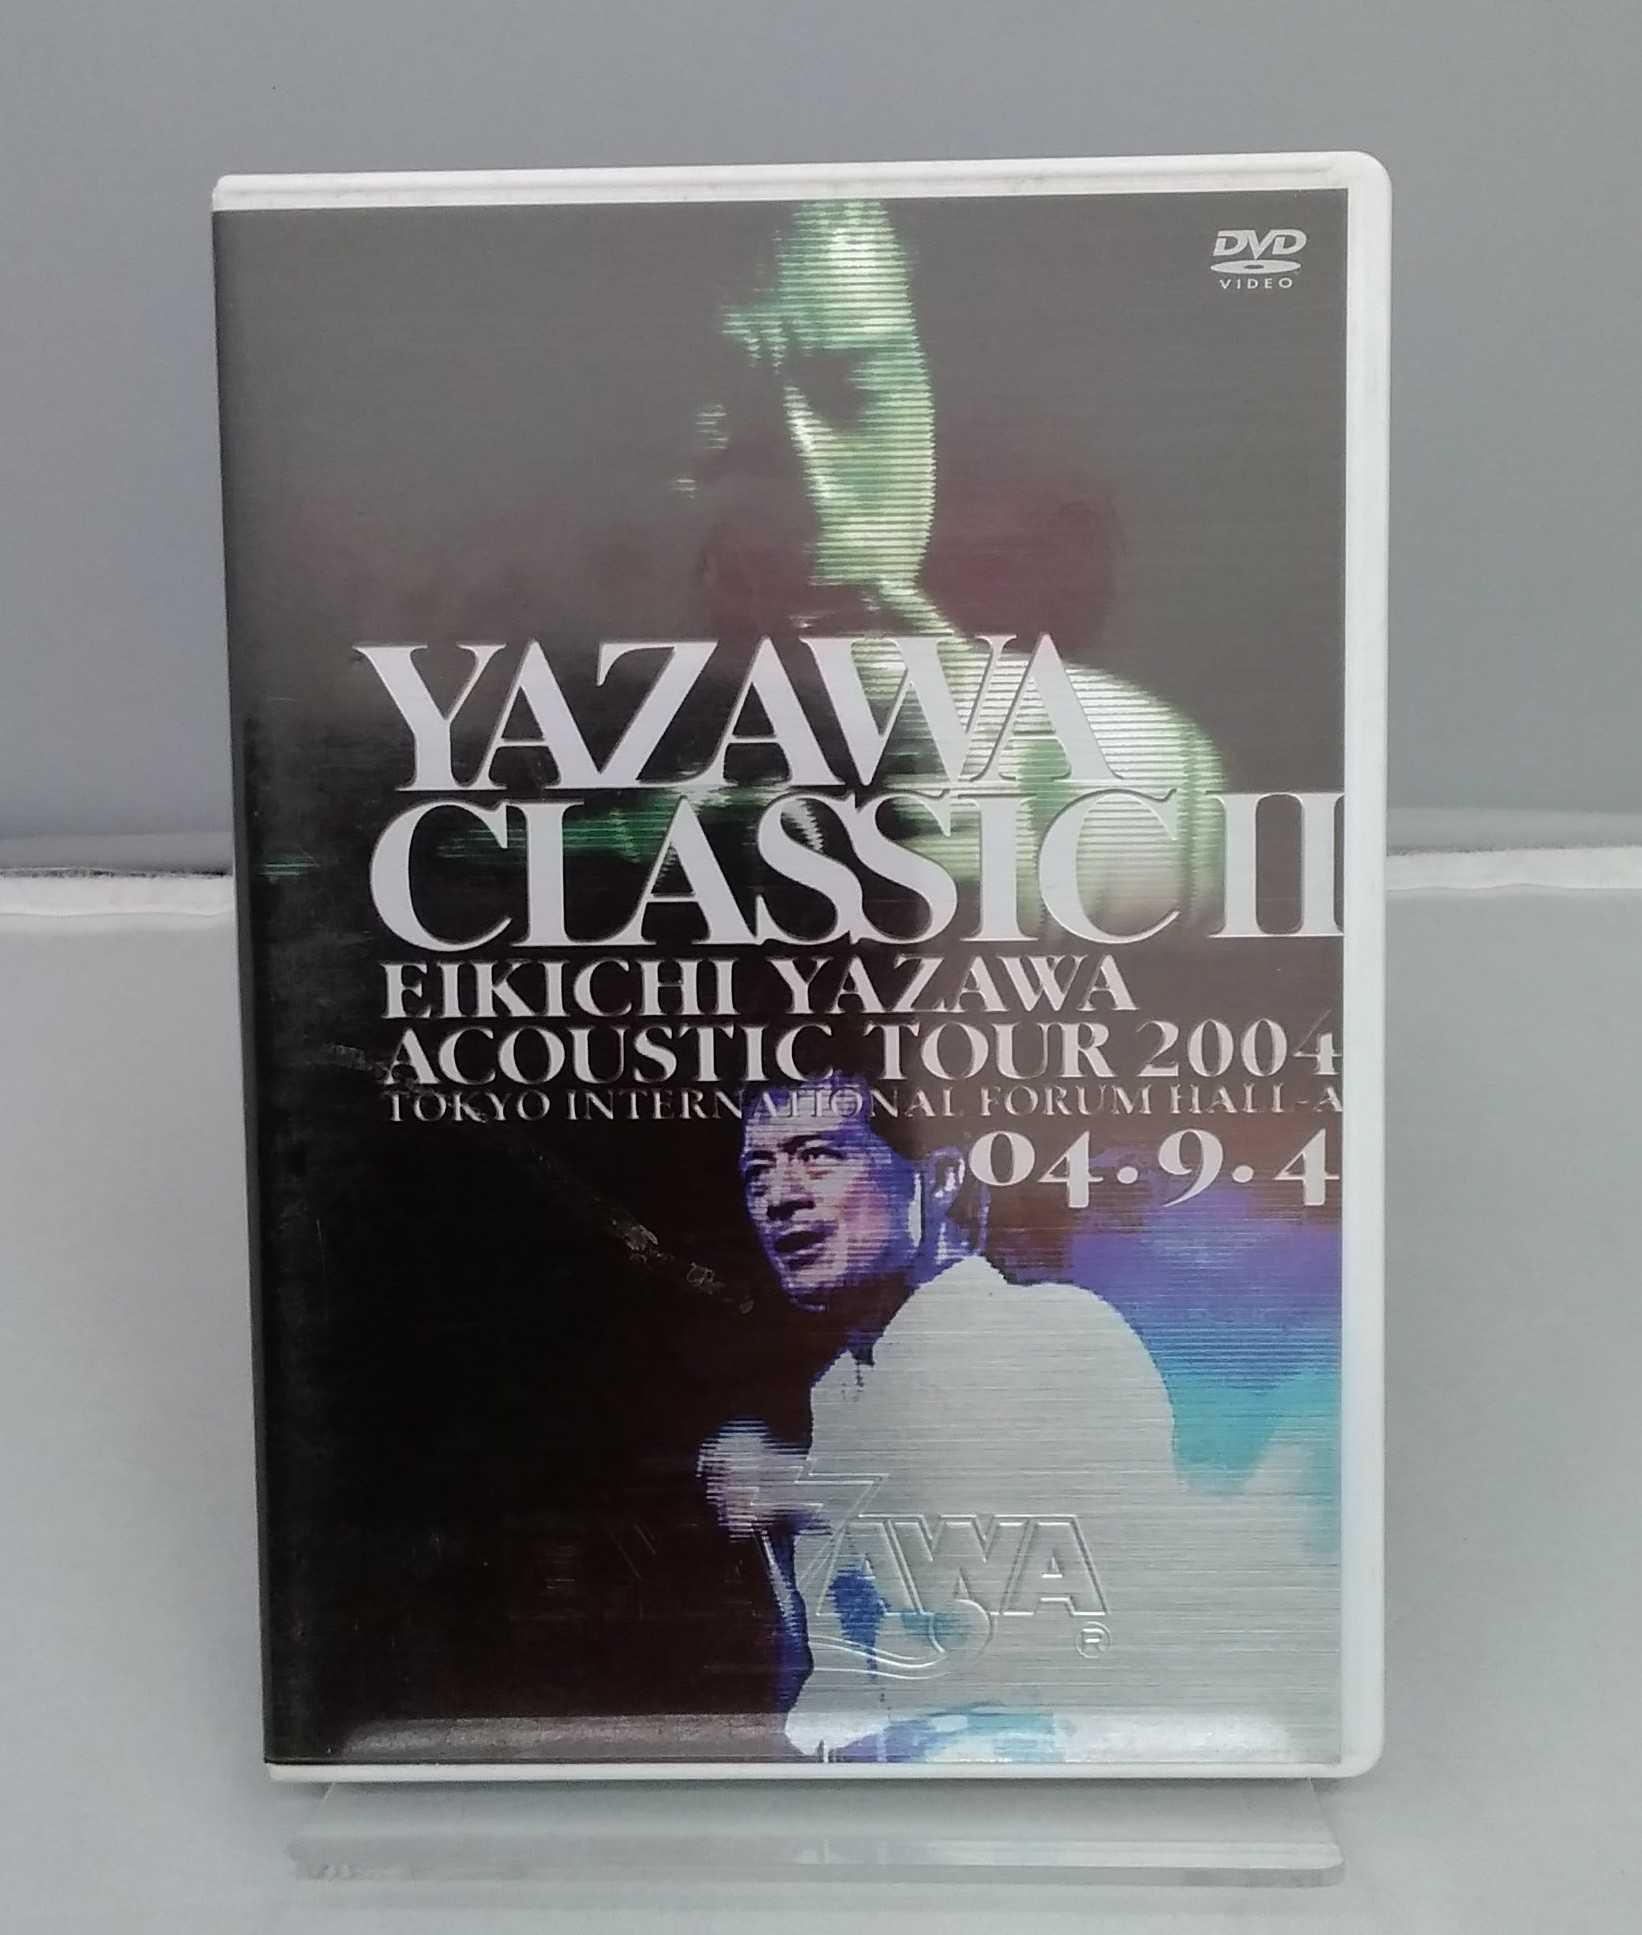 YAZAWA CLASSICⅡ|東芝EMI株式会社